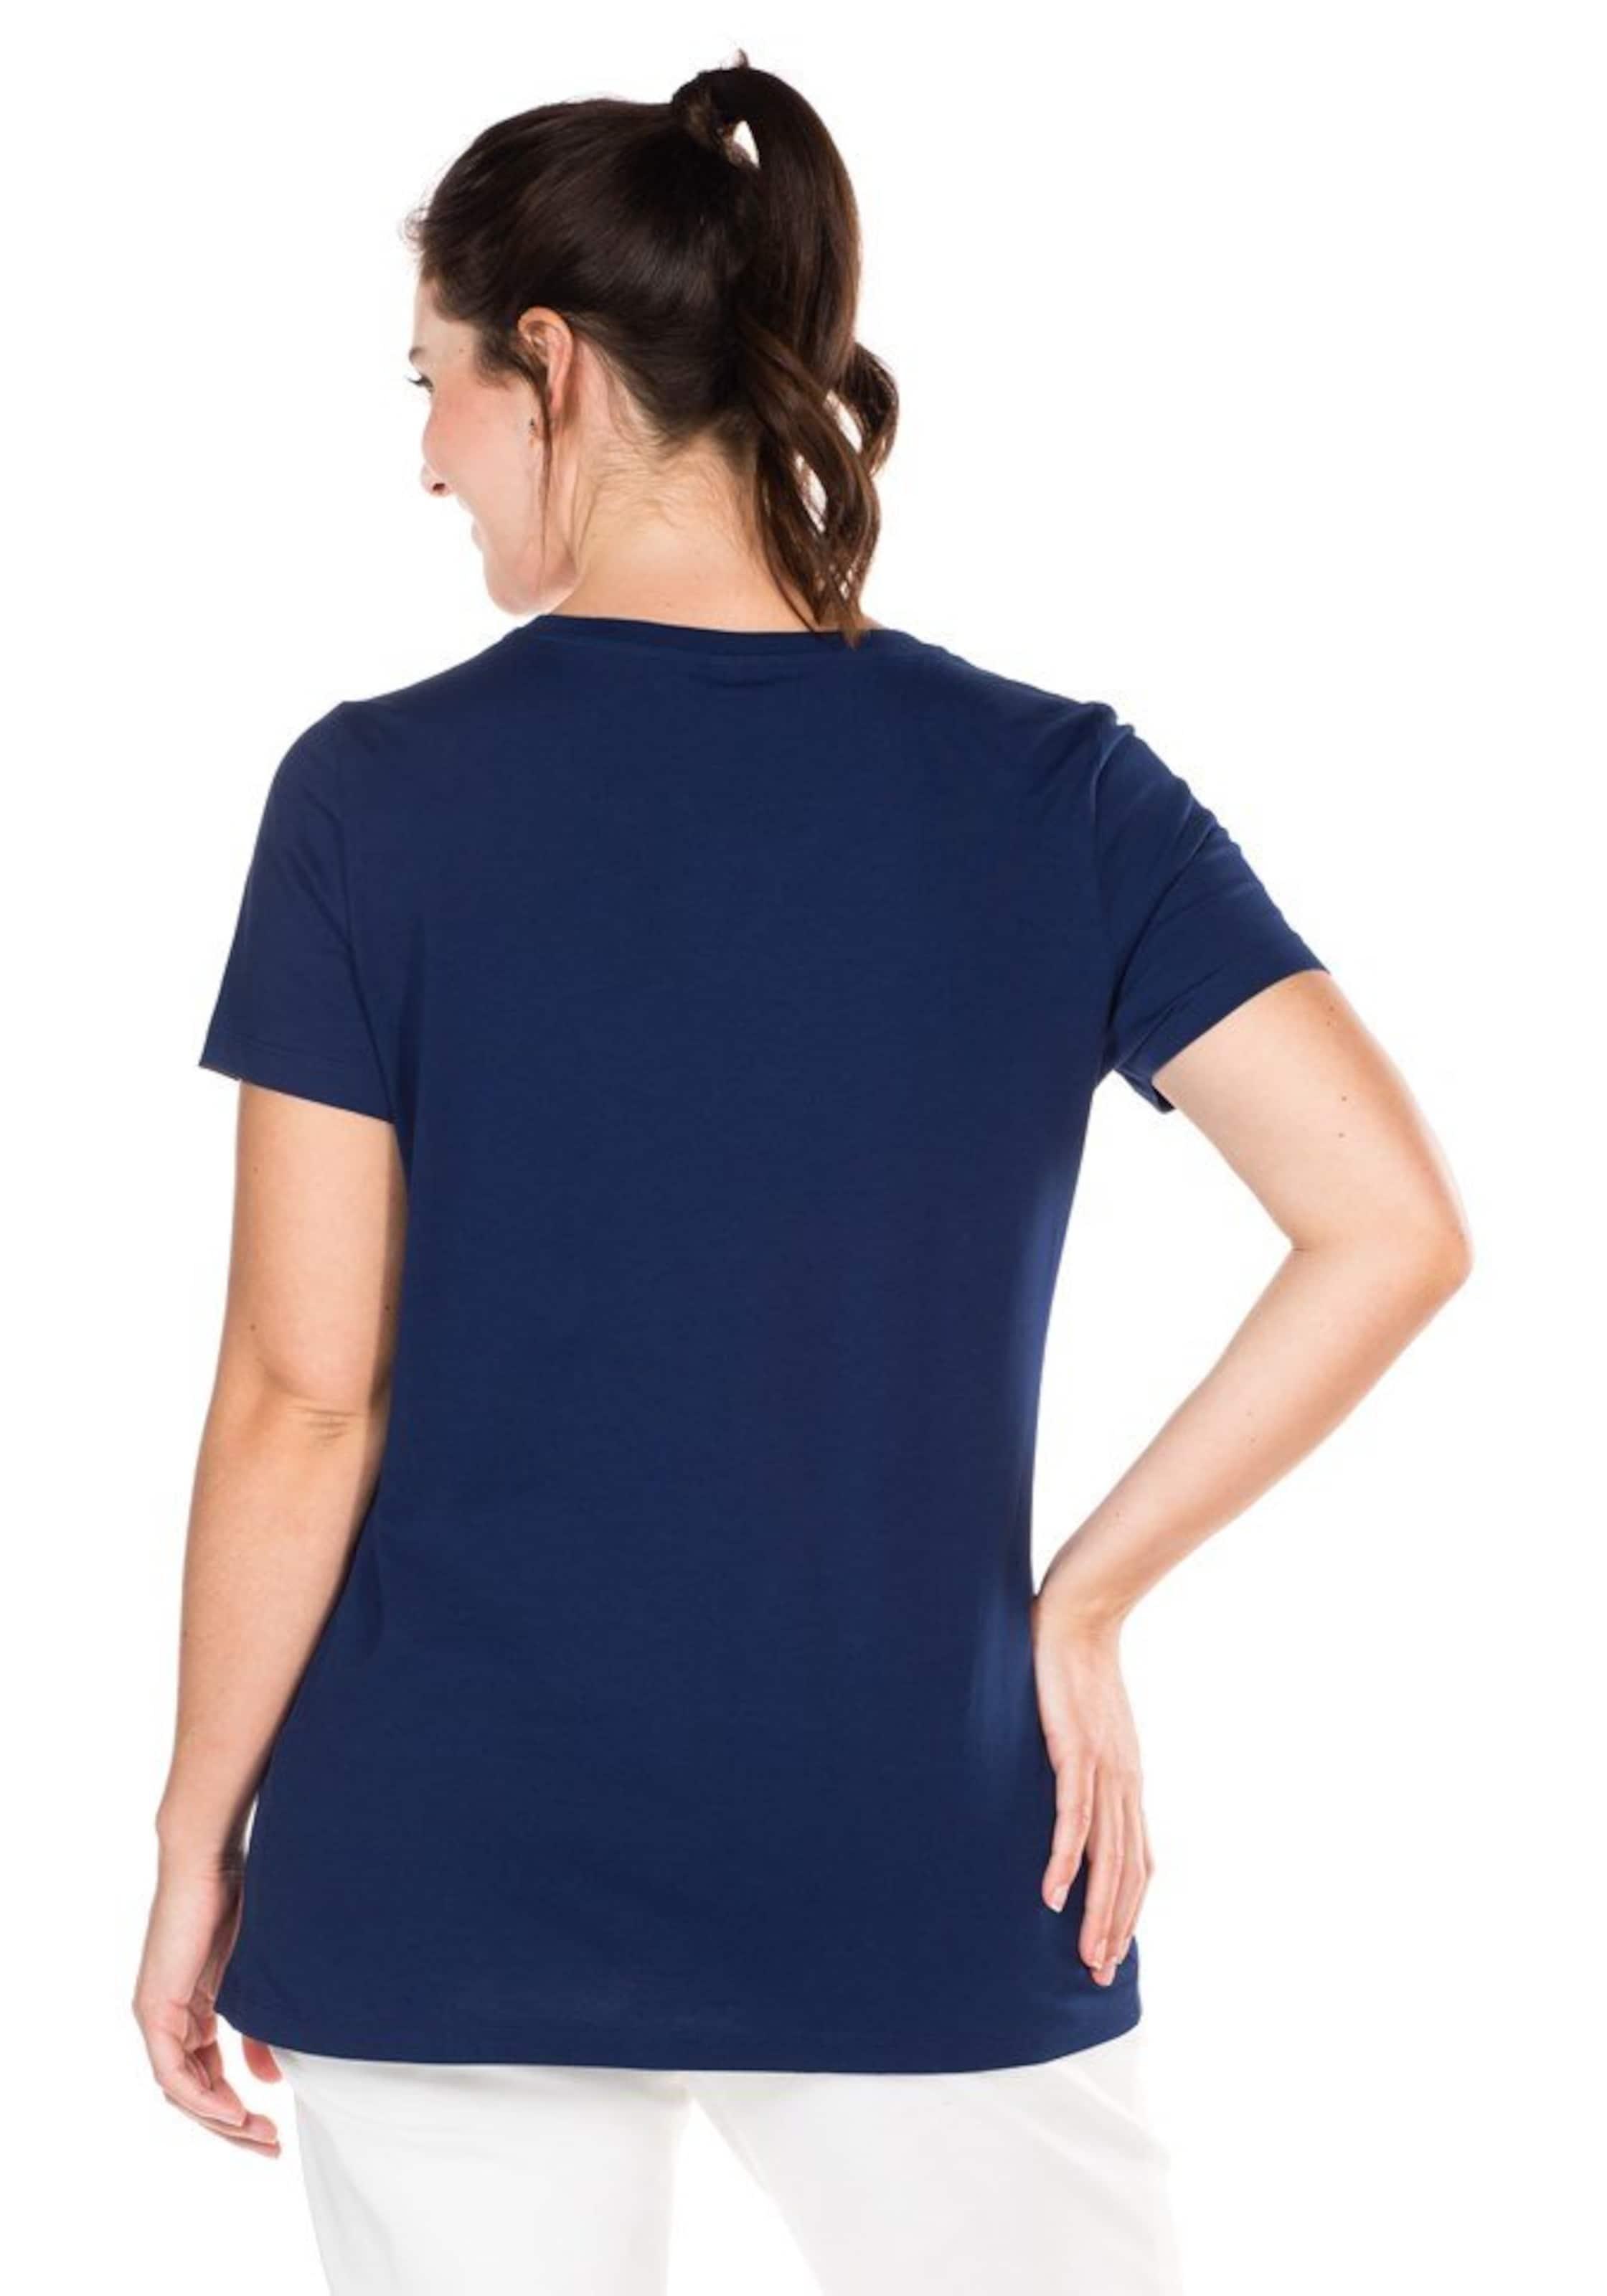 Casual Sheego In NachtblauWeiß T shirt eCxWrdQEBo